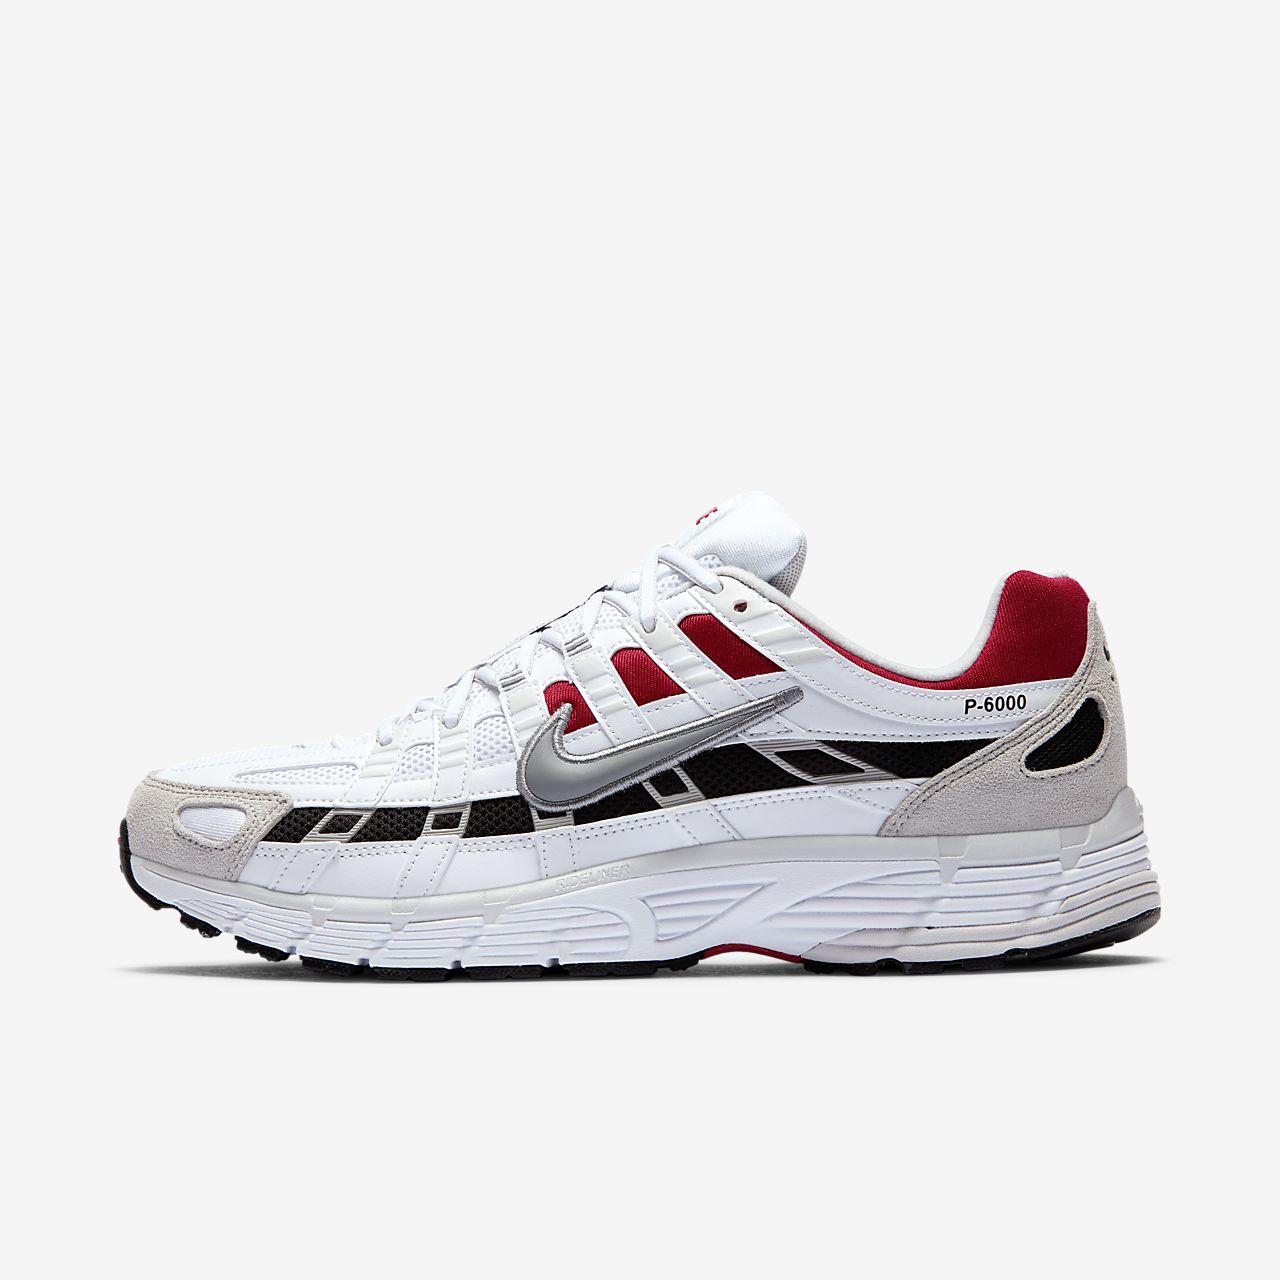 Nike P 6000 Men's Shoe